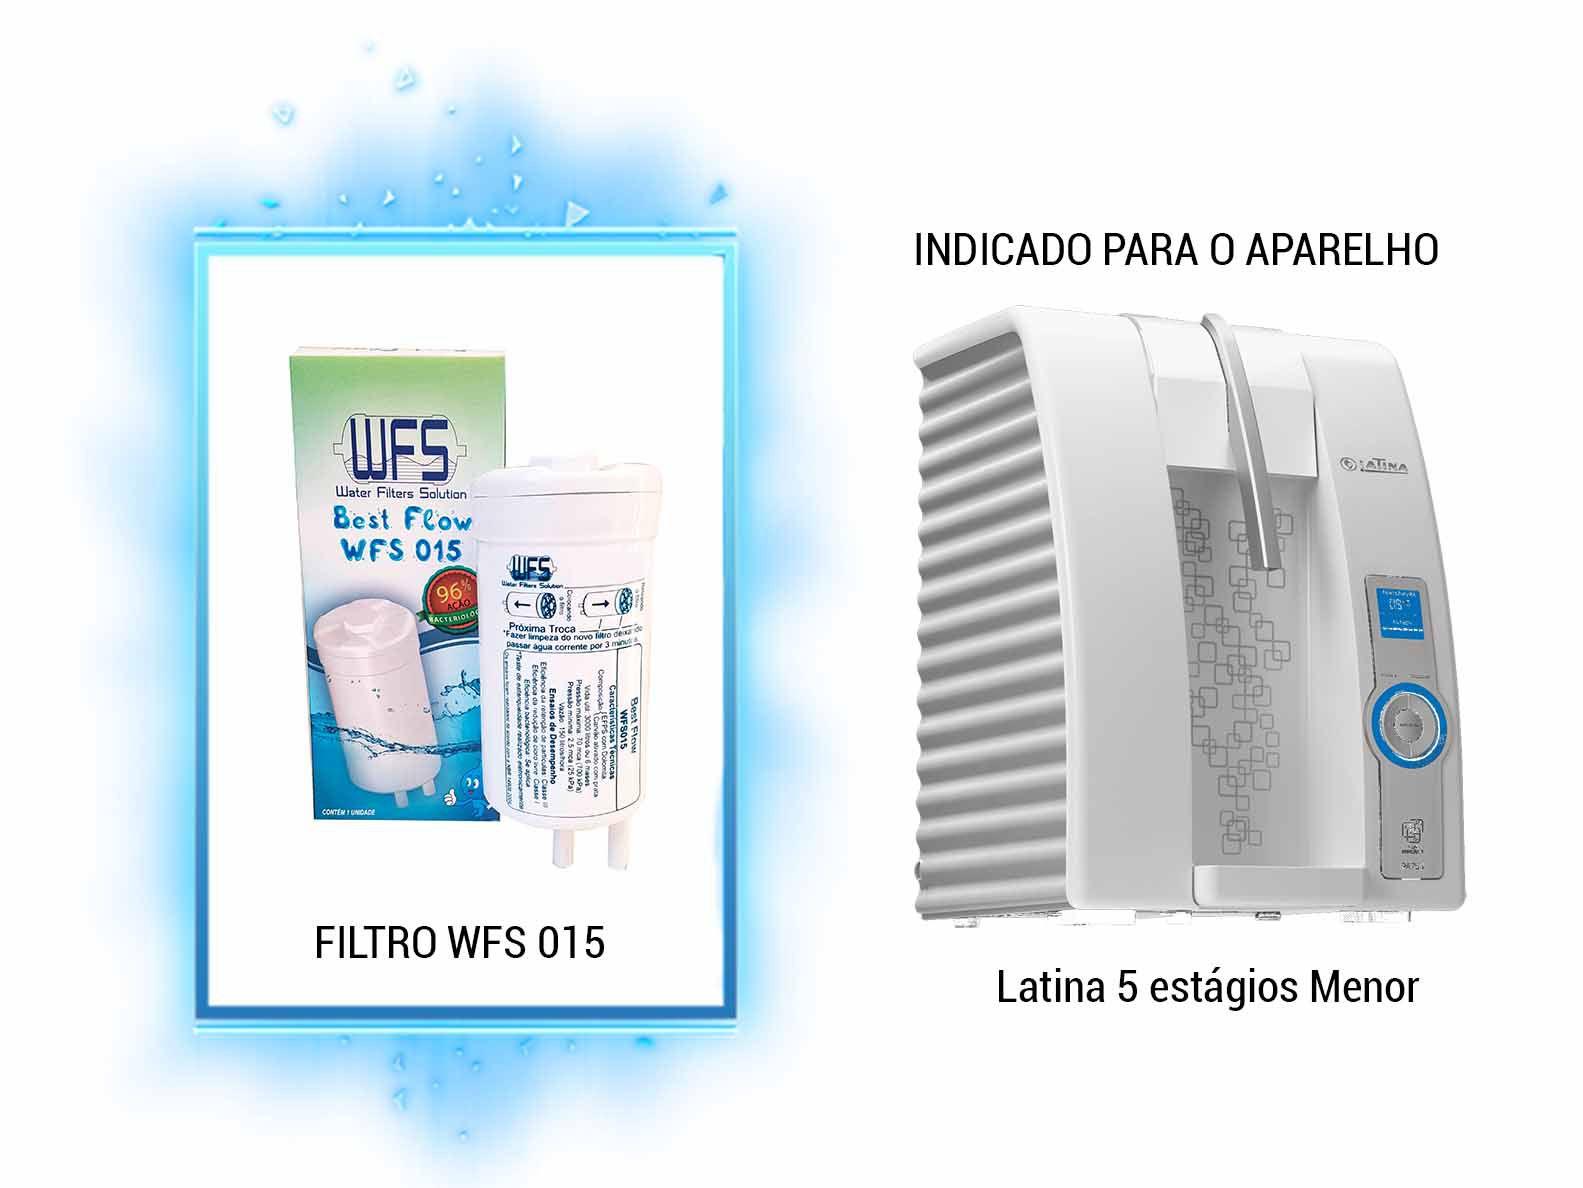 FILTRO BEBEDOURO 5 ESTAGIOS P635 (BEST FLOW) Refil Purificador Latina| Wfs 015 |Best Flow